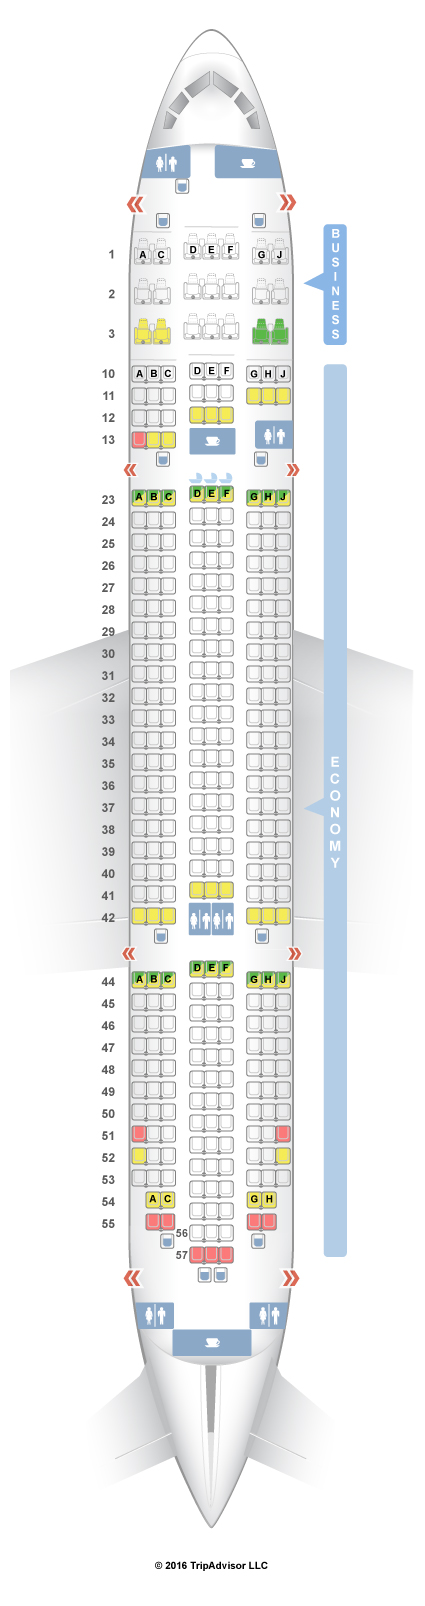 seatguru seat map jetstar boeing 787 8 788